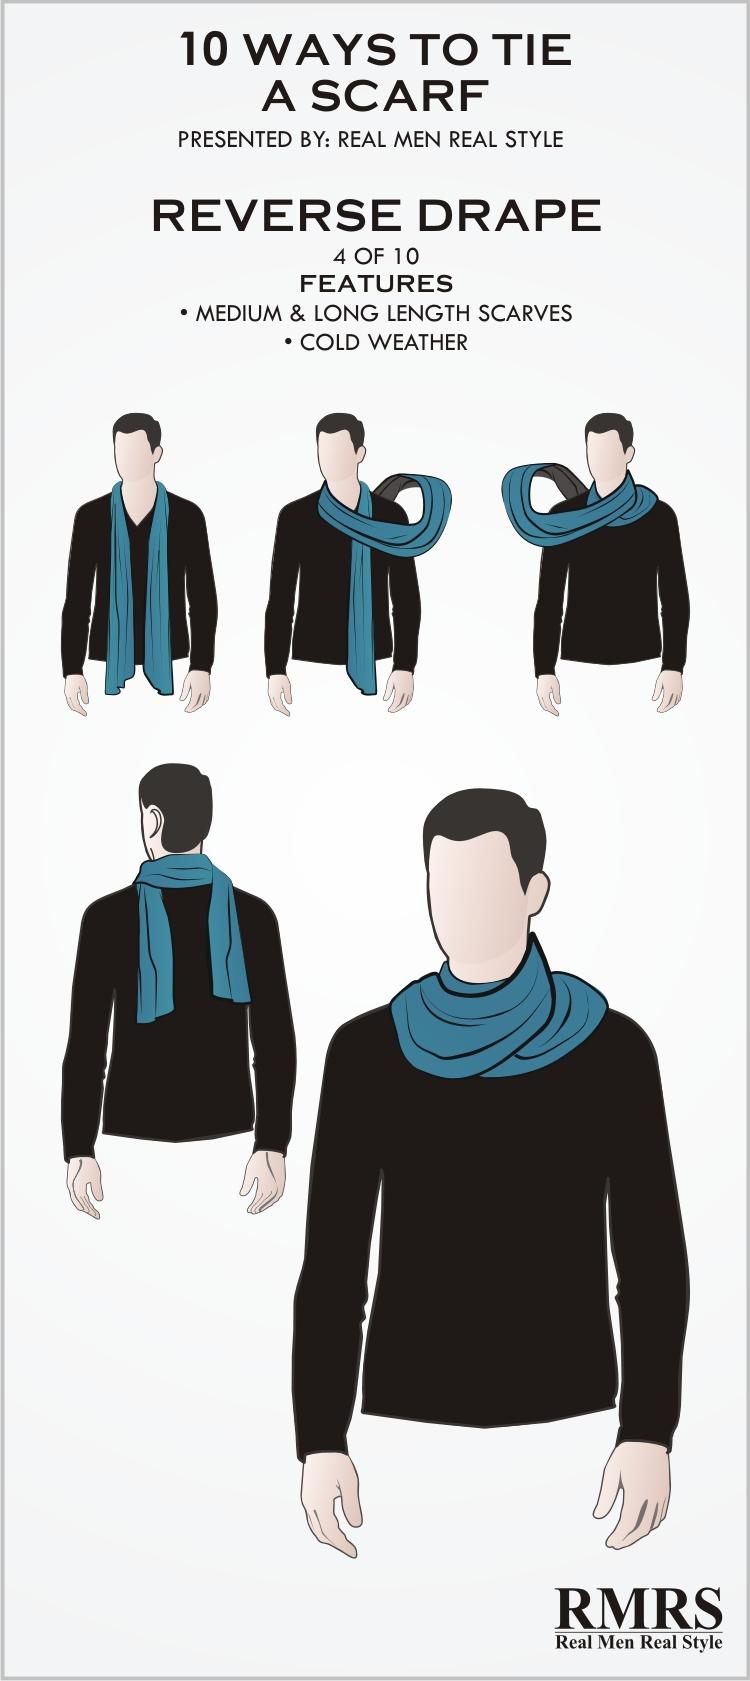 10-ways-to-tie-a-scarf-finall-full-4.jpg